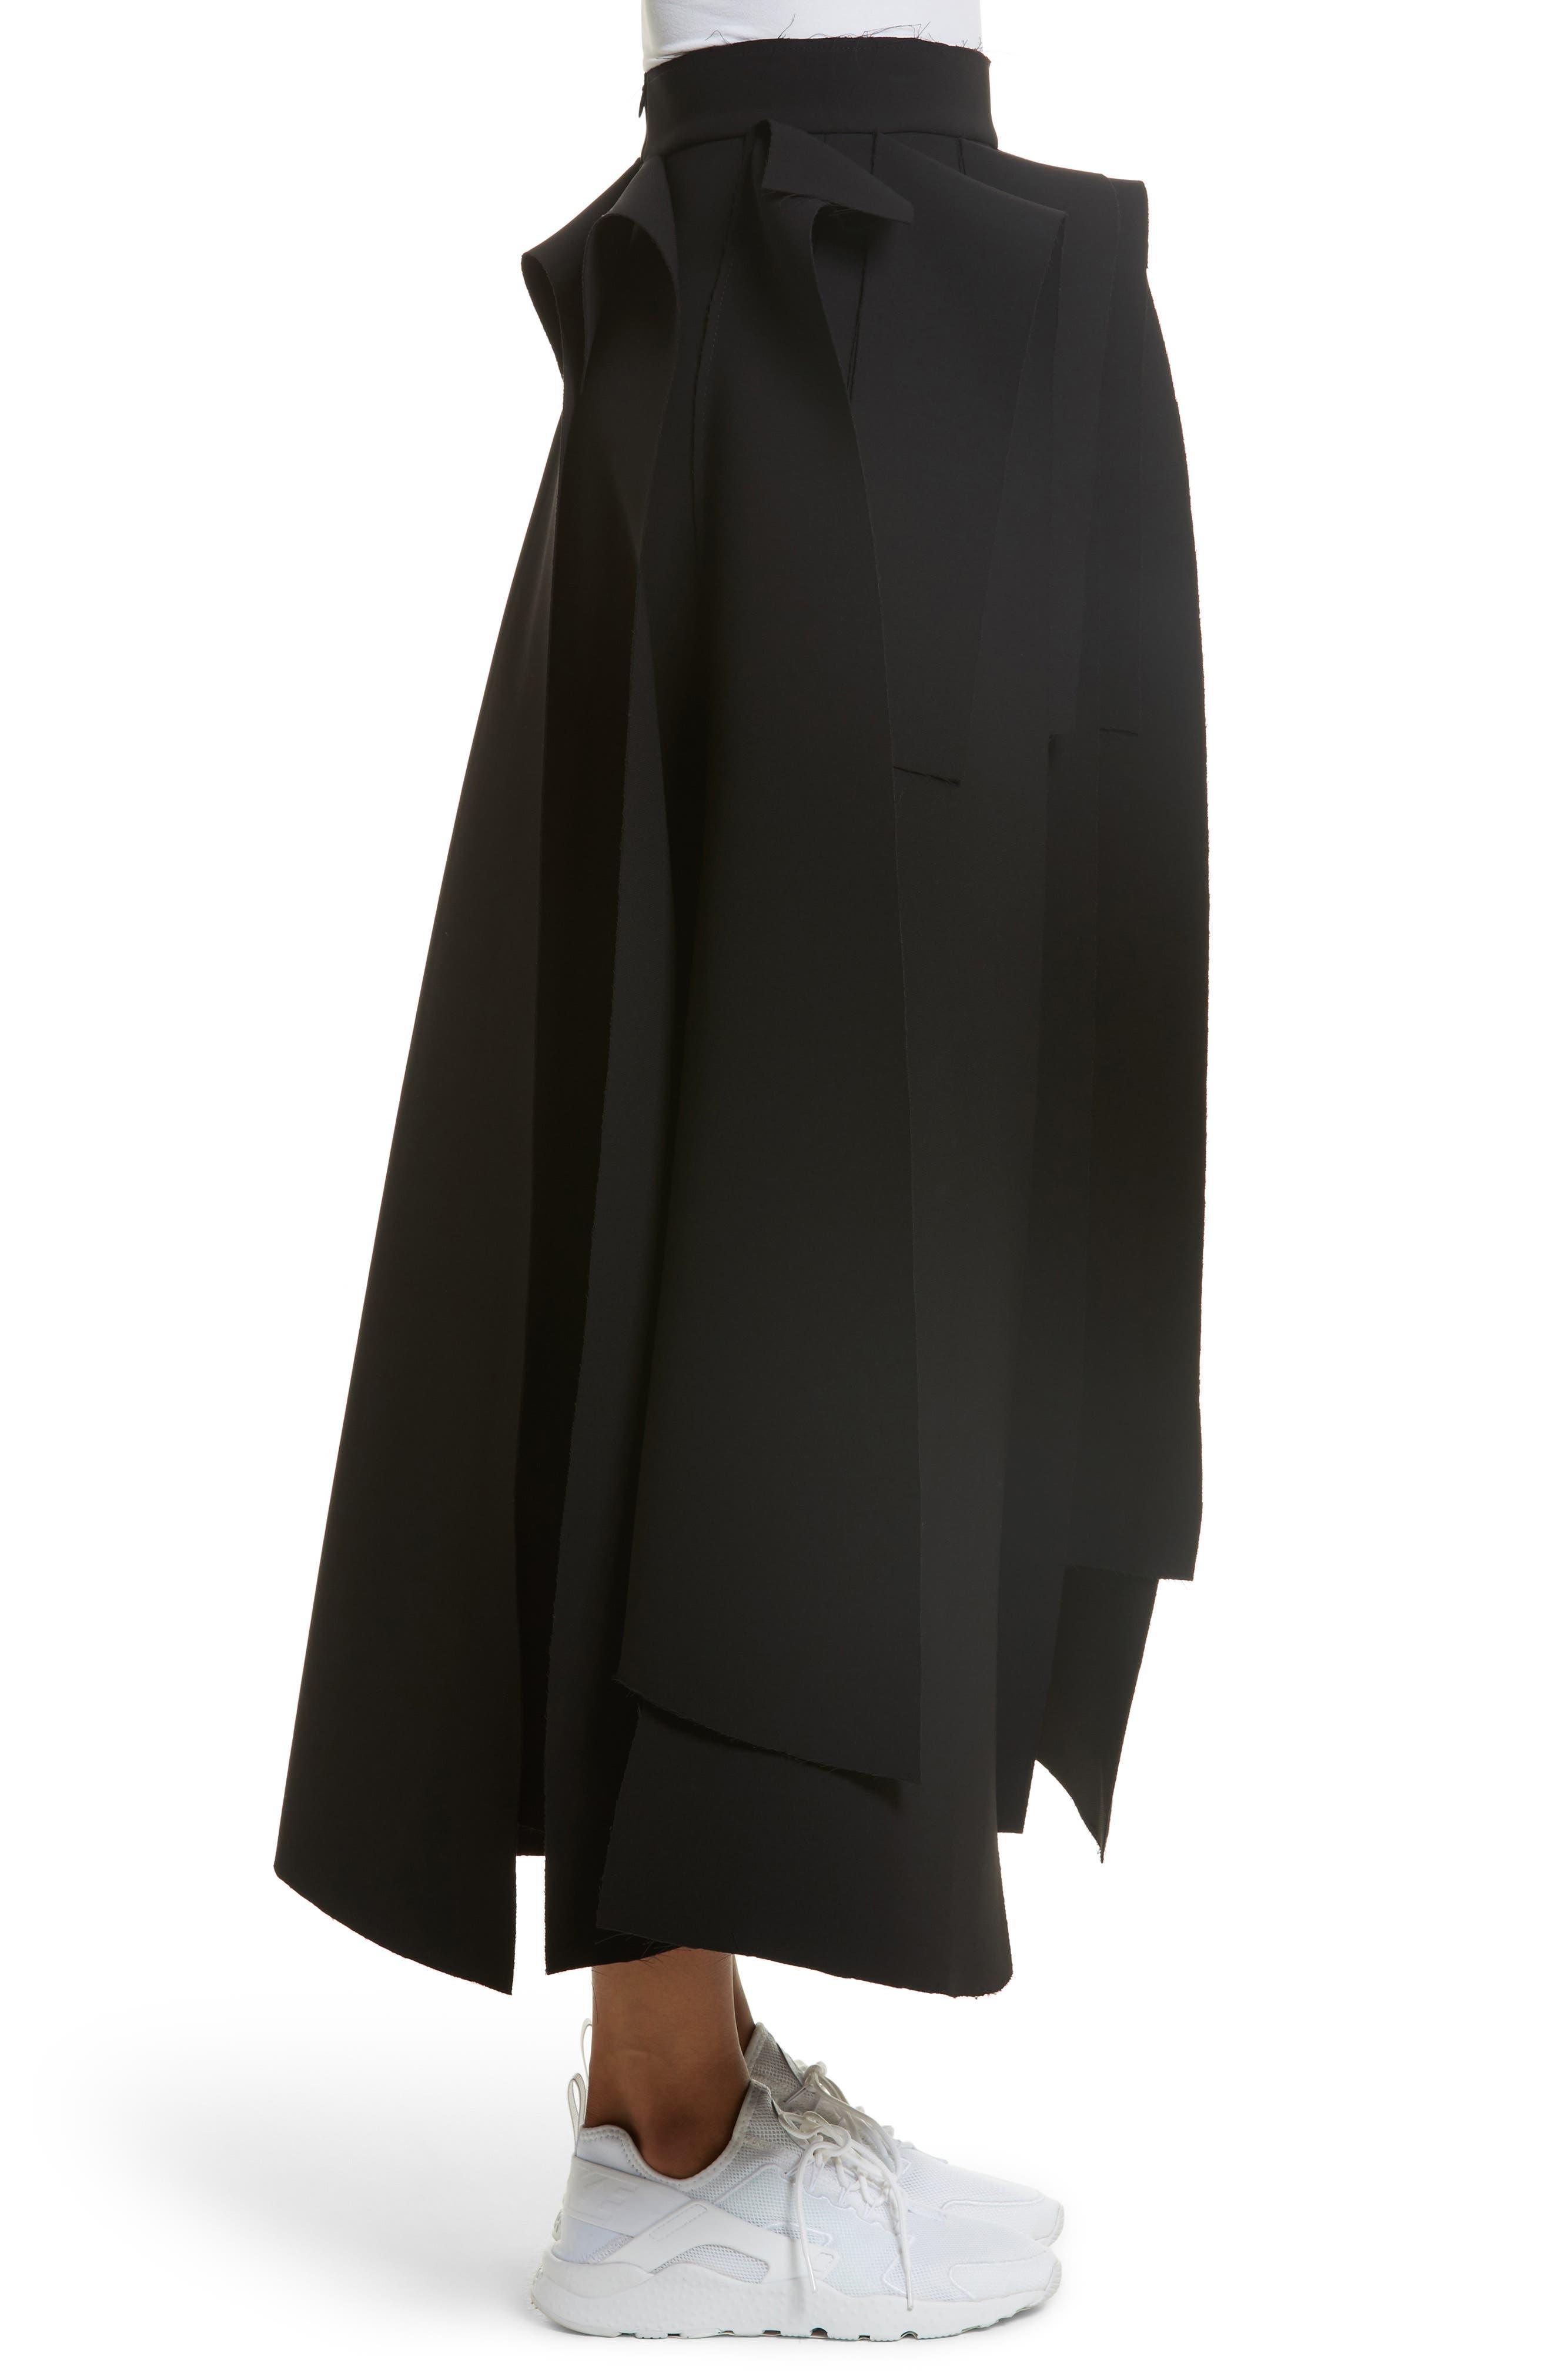 Alternate Image 3  - A.W.A.K.E. Asymmetric Panel Skirt